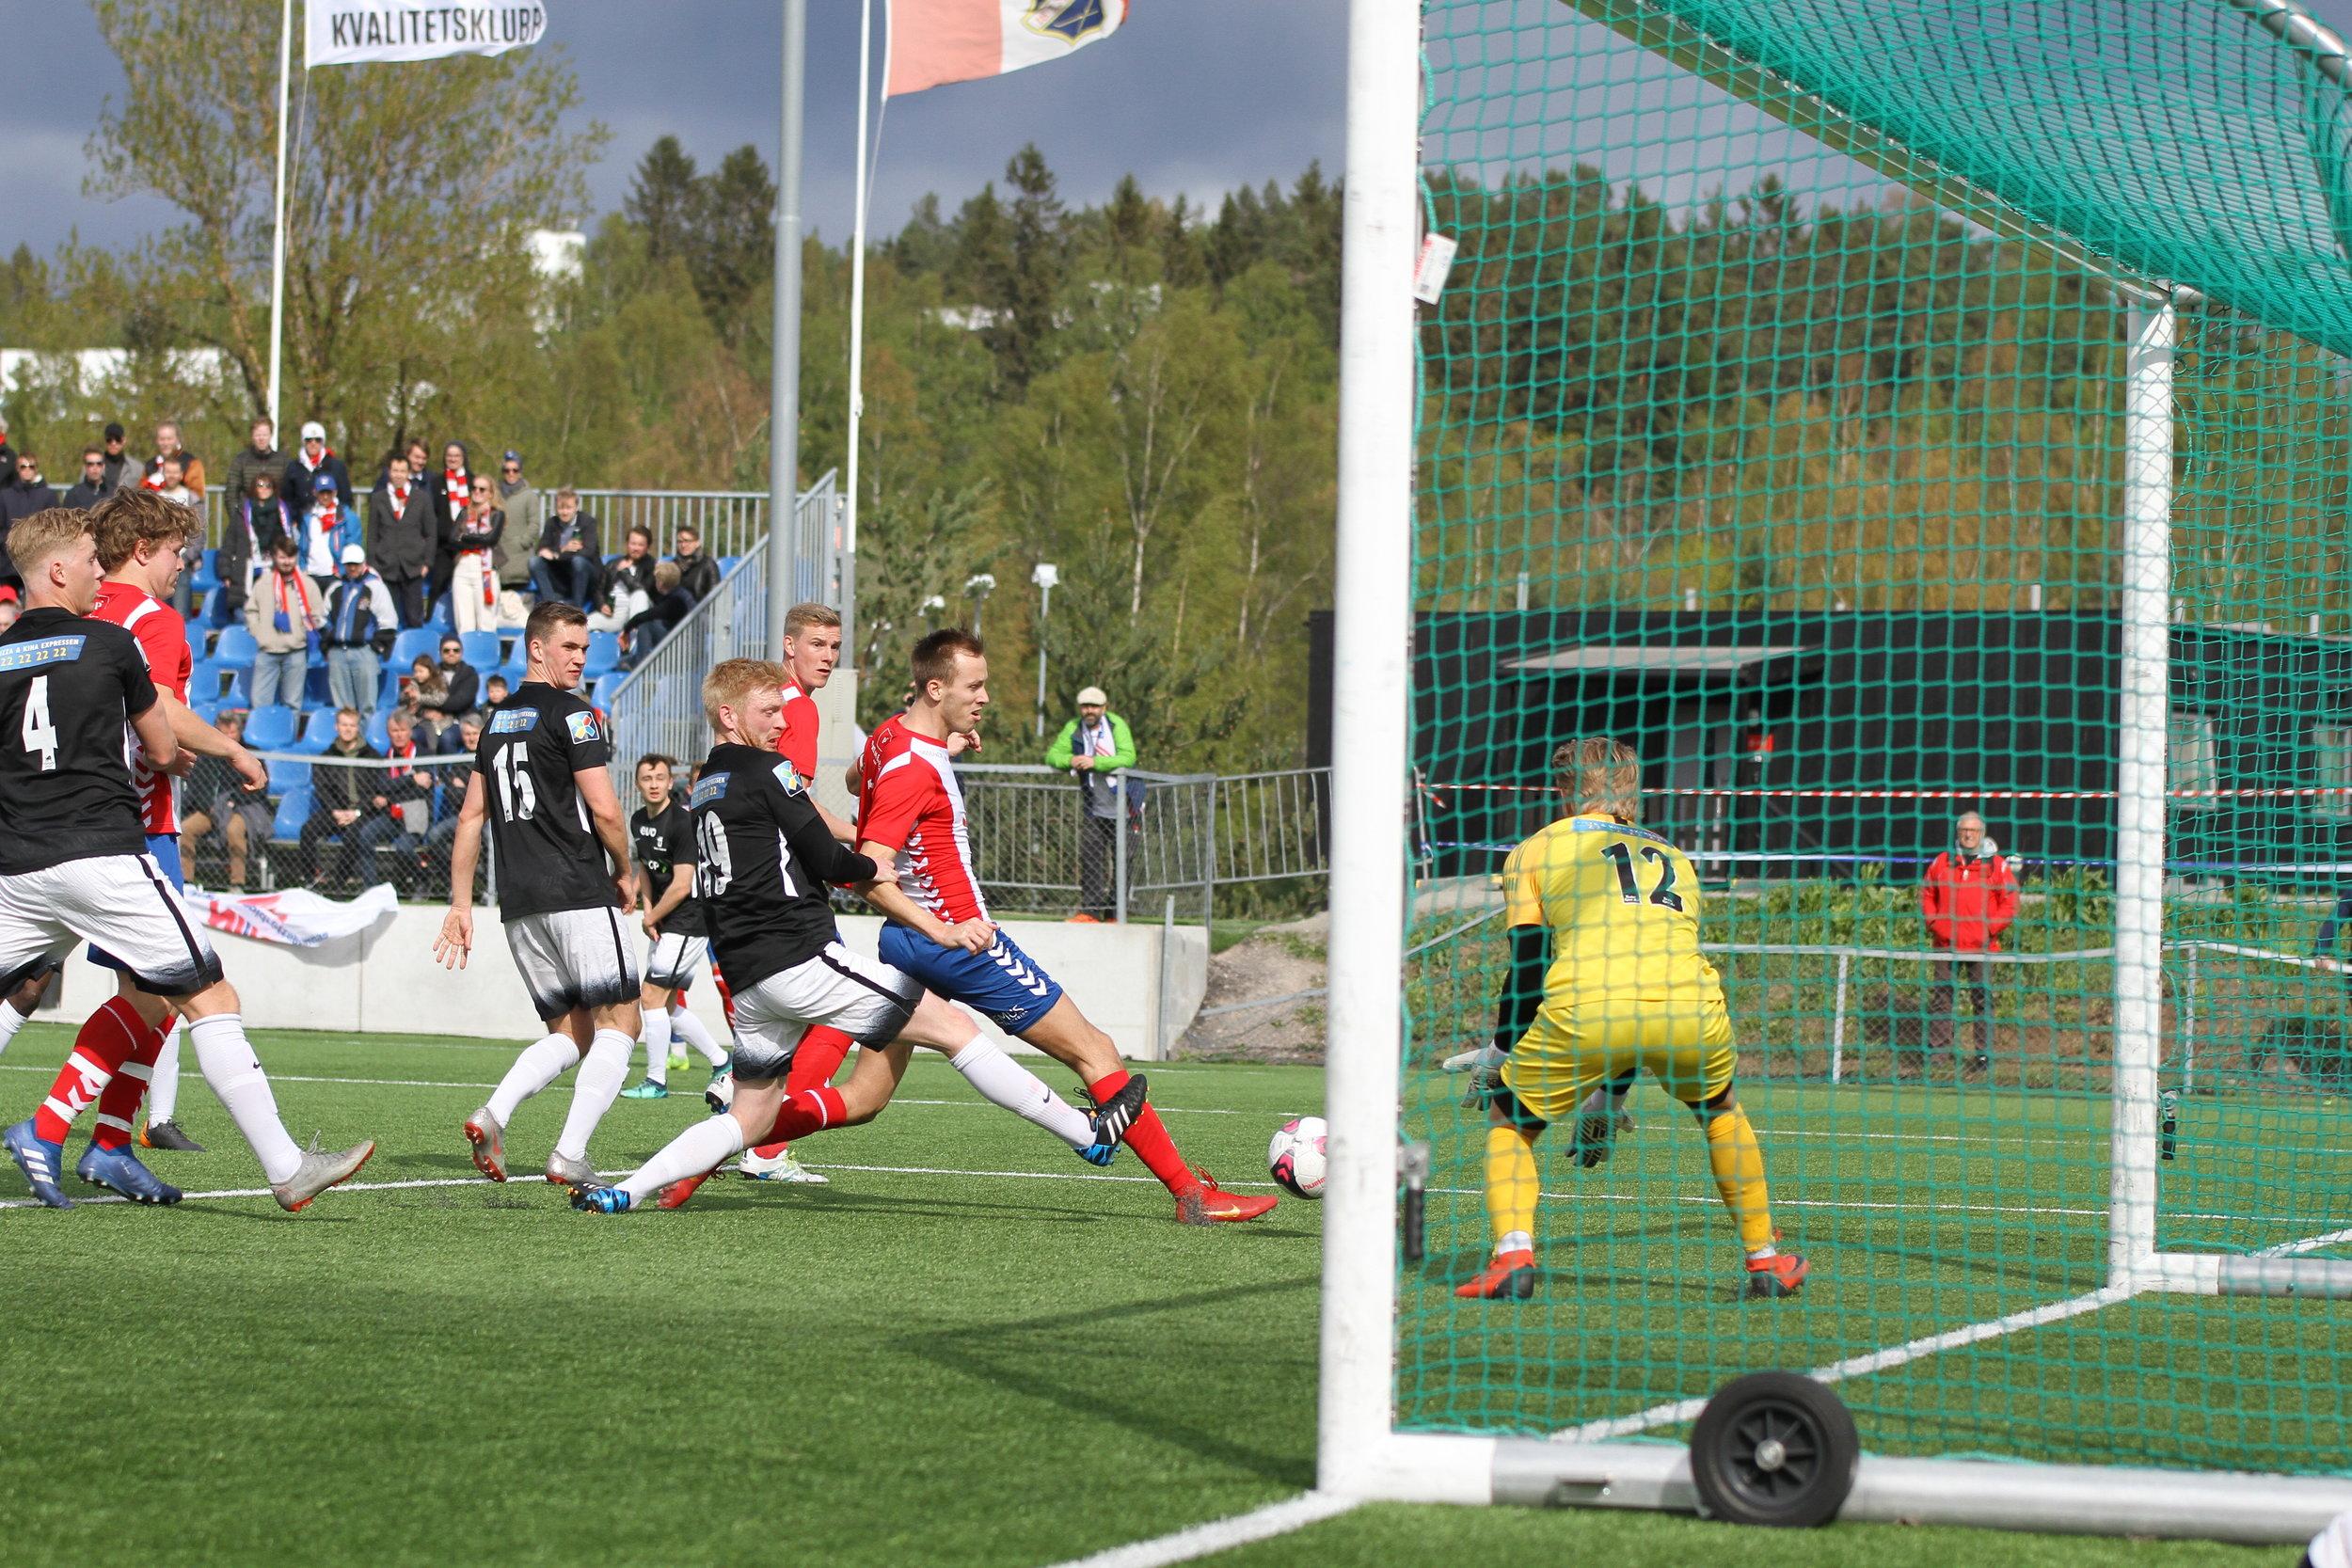 Benjamin Nessjø Nyheim scoret i det som var hans 100. kamp i Lyn-drakten. Arkivfoto: Frank Halse